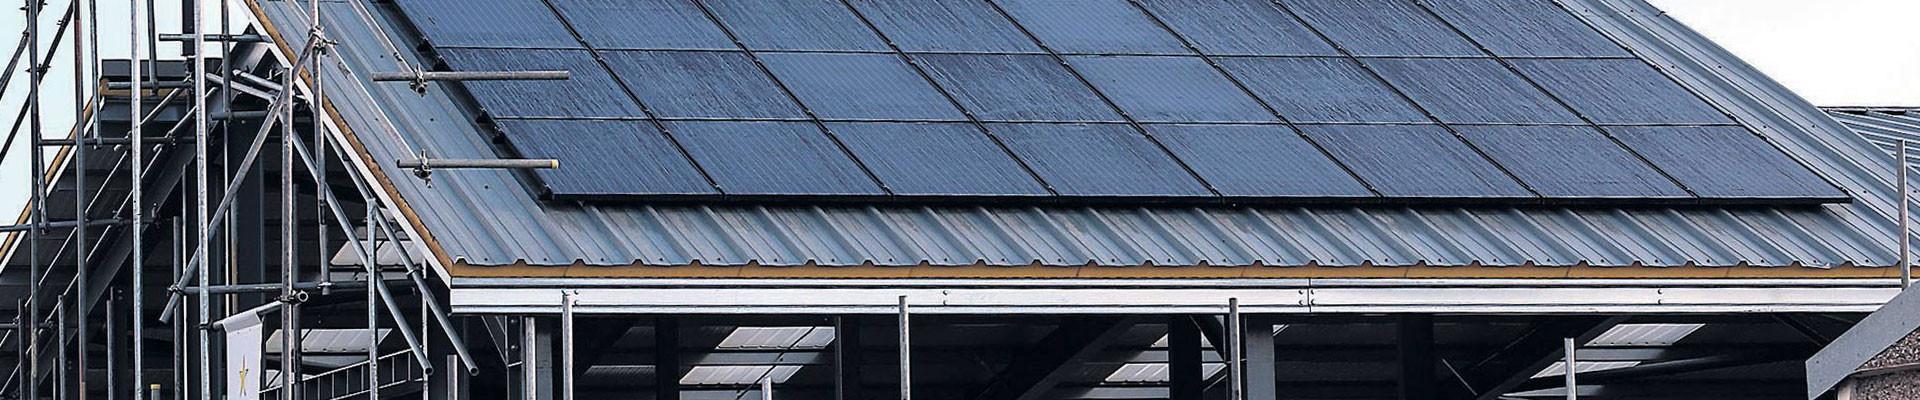 Commercial Solar PV and Farm Solar PV